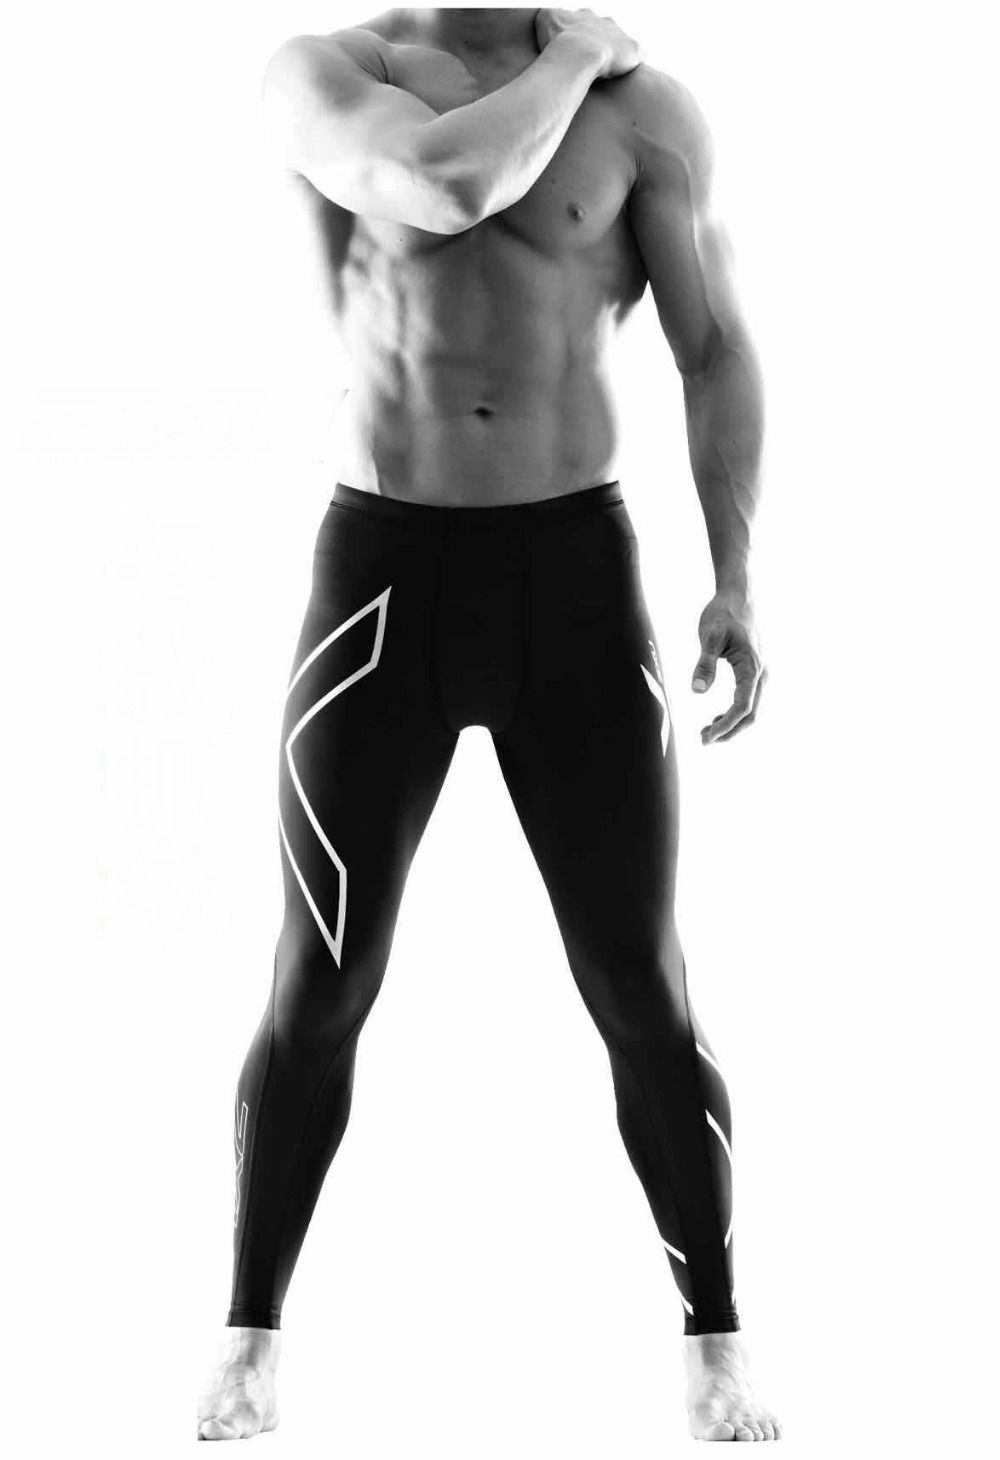 Calça Compressão Corrida Musculação Térmica Masculina 2XU (similar)